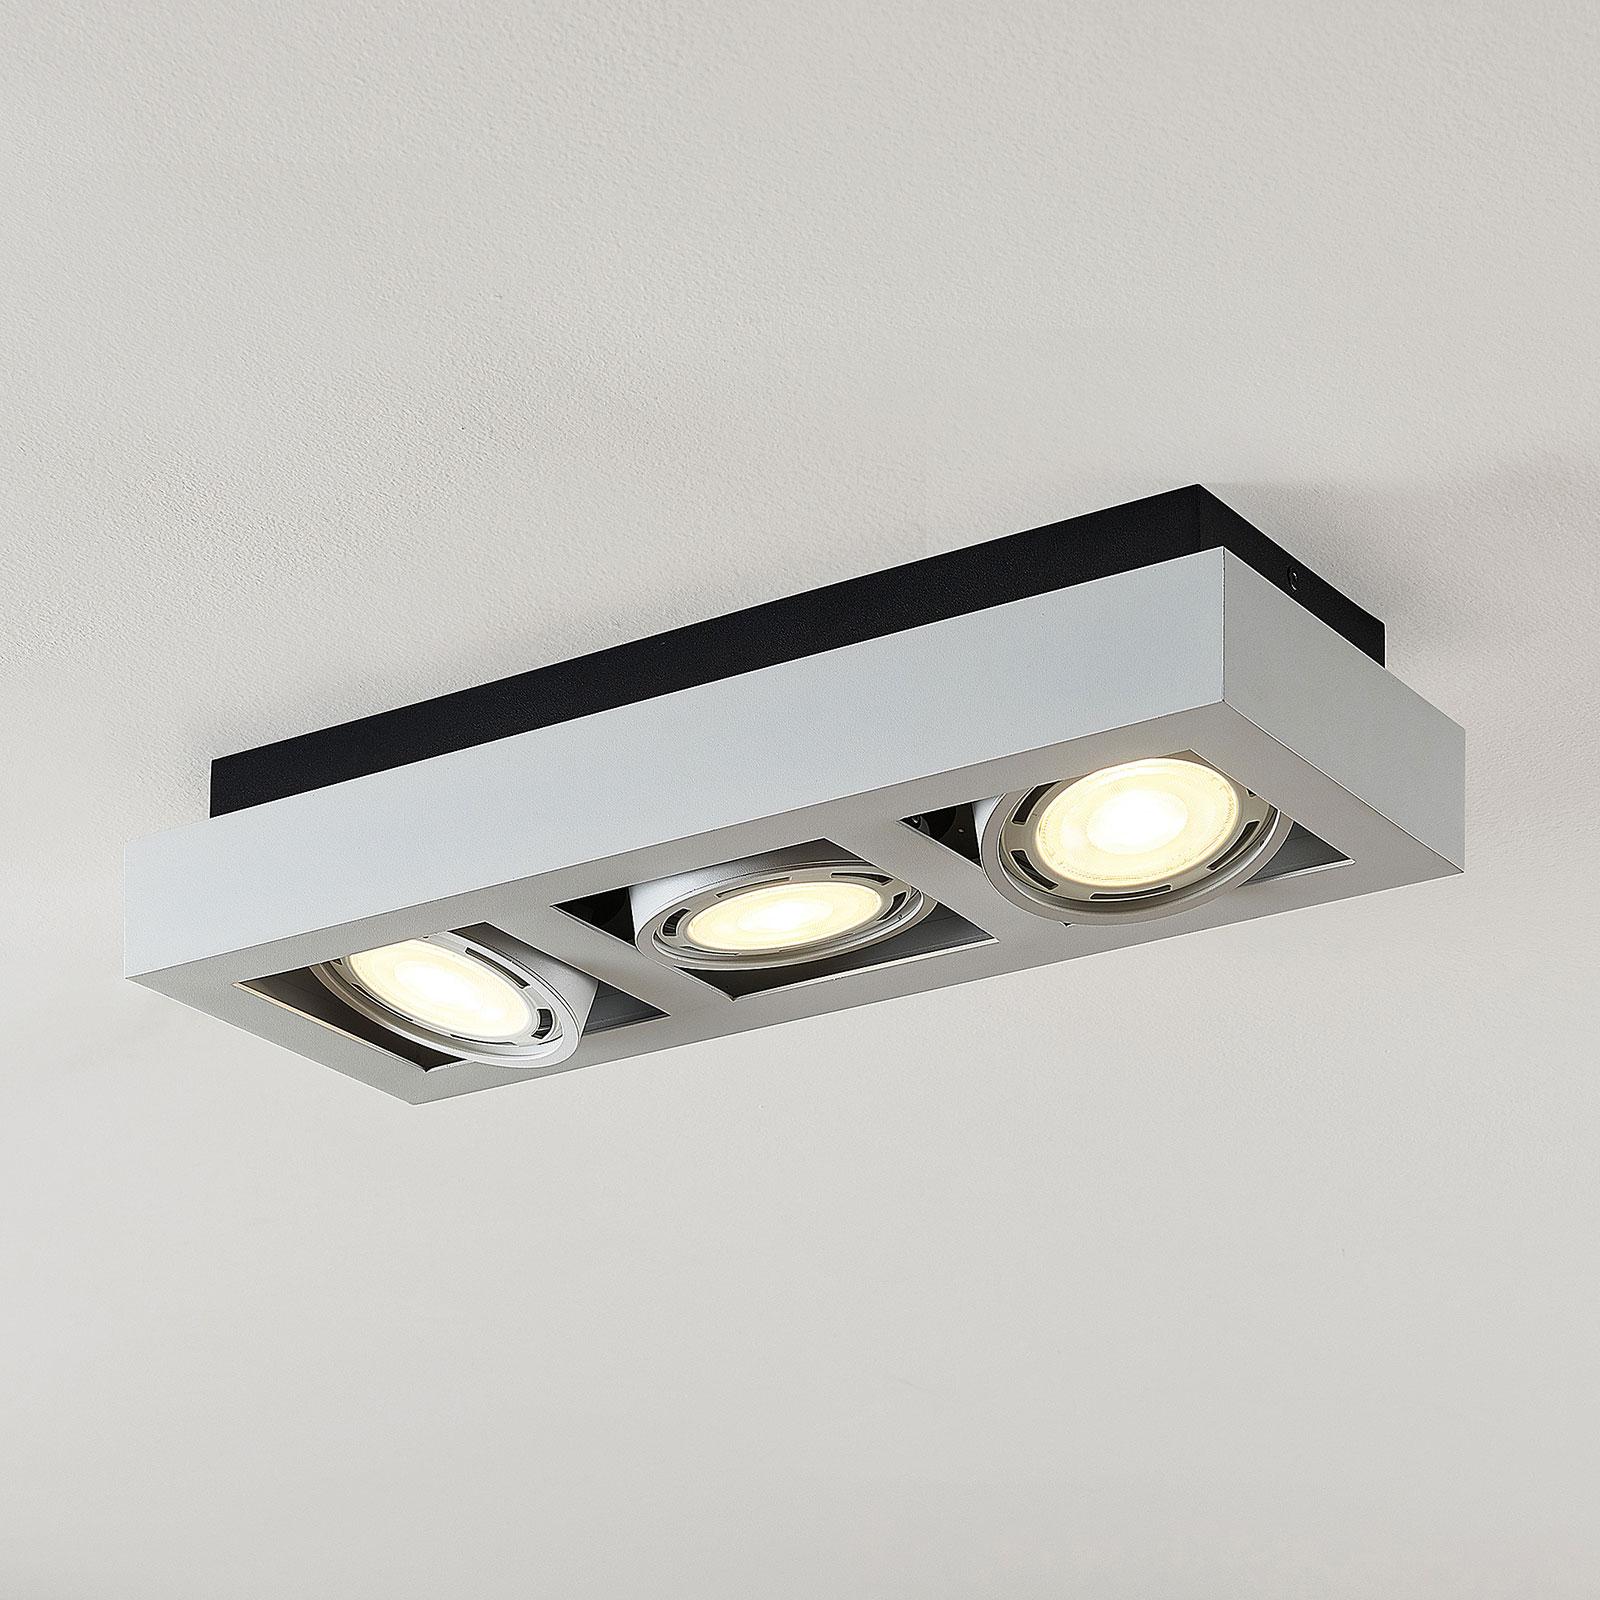 LED-Deckenstrahler Ronka, GU10, 3-fl., weiß